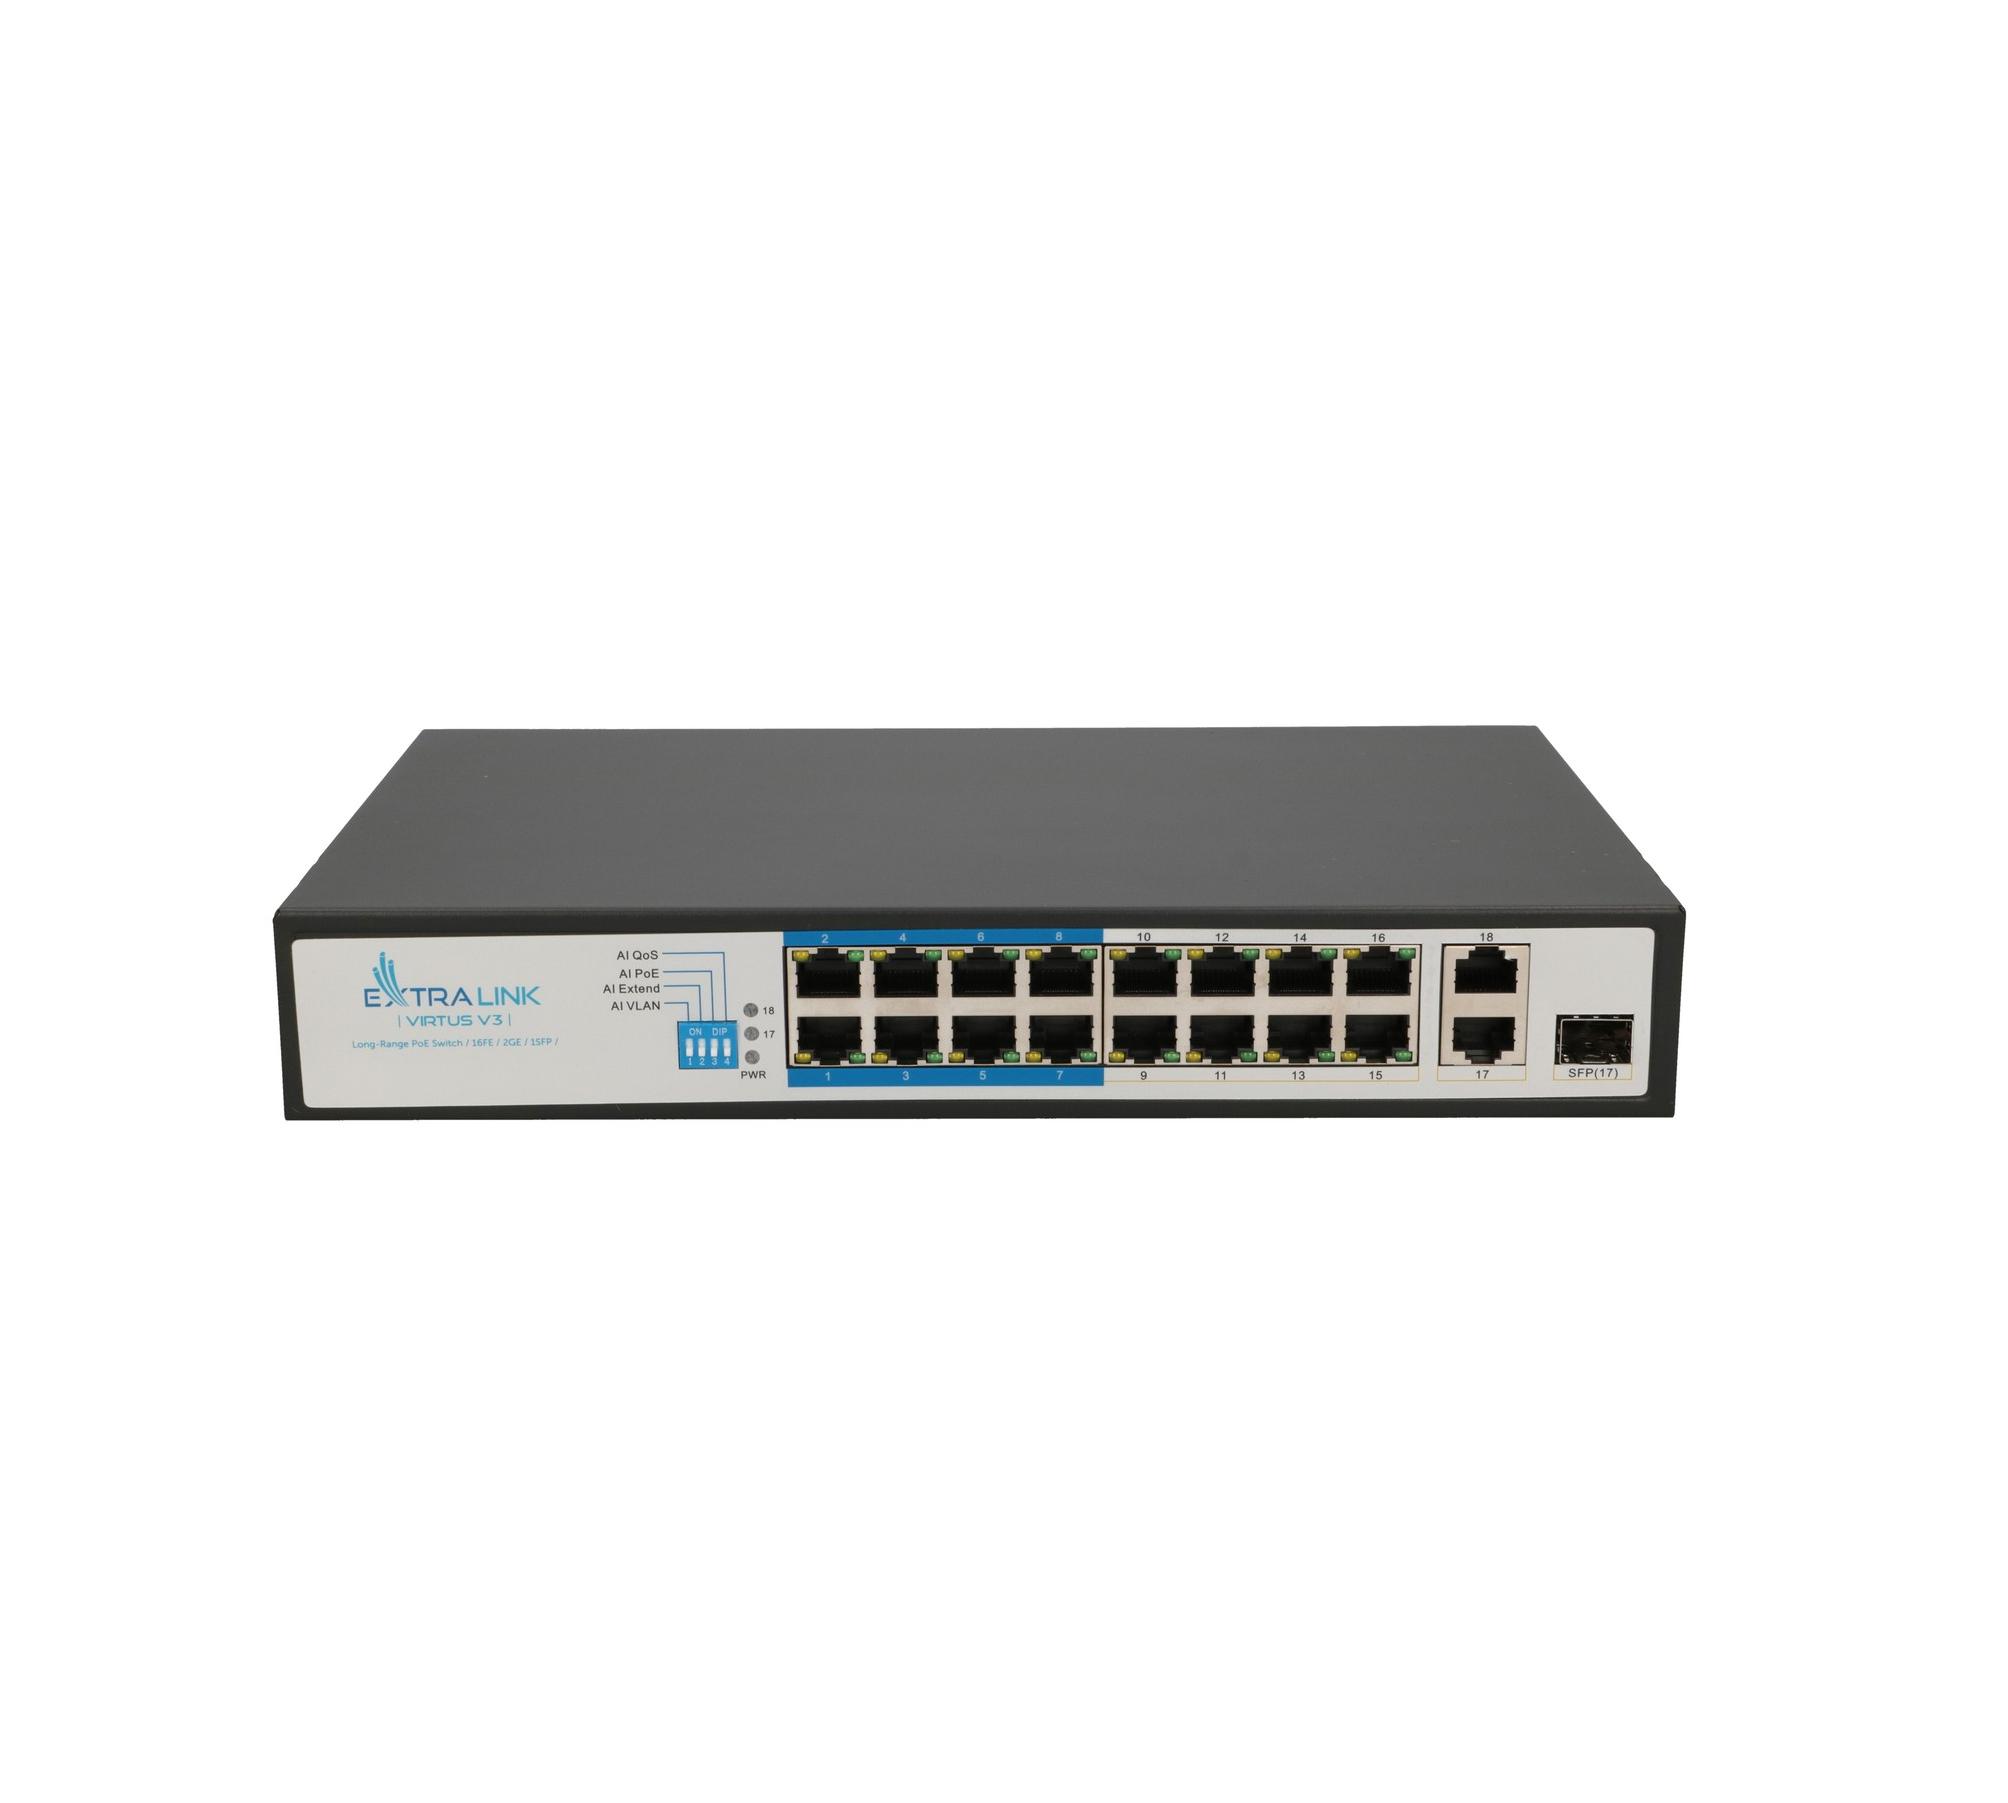 Extralink VIRTUS V3 PoE Switch 16x 100Mb/s PoE/PoE+, 2x Gigabit RJ45 + 1x SFP, 150W